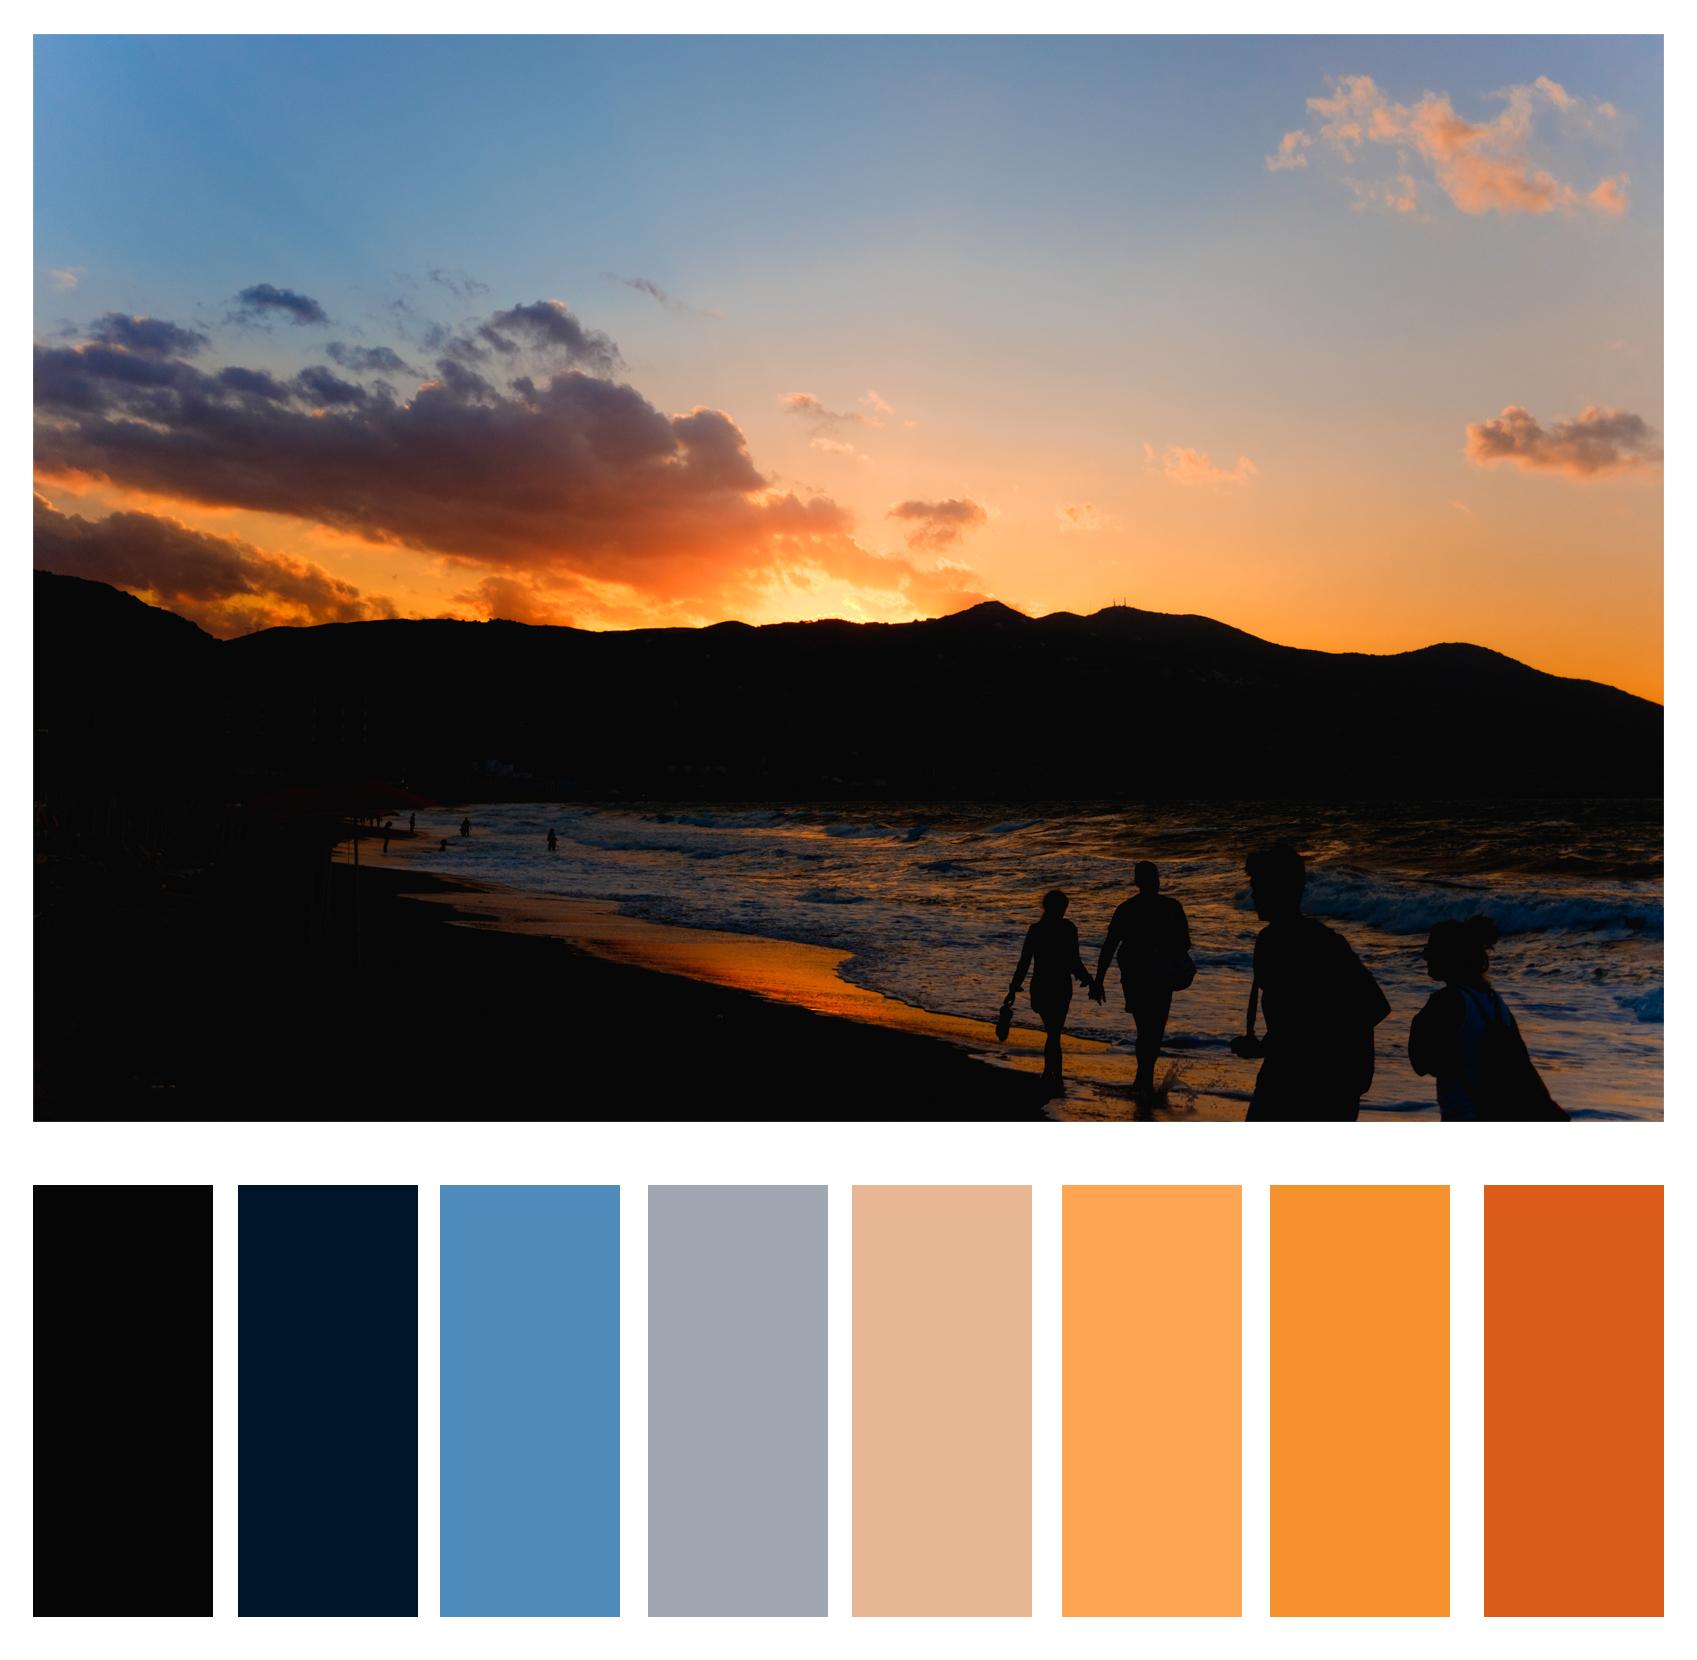 Figure 3c: Darker shades of blue complement oranges.